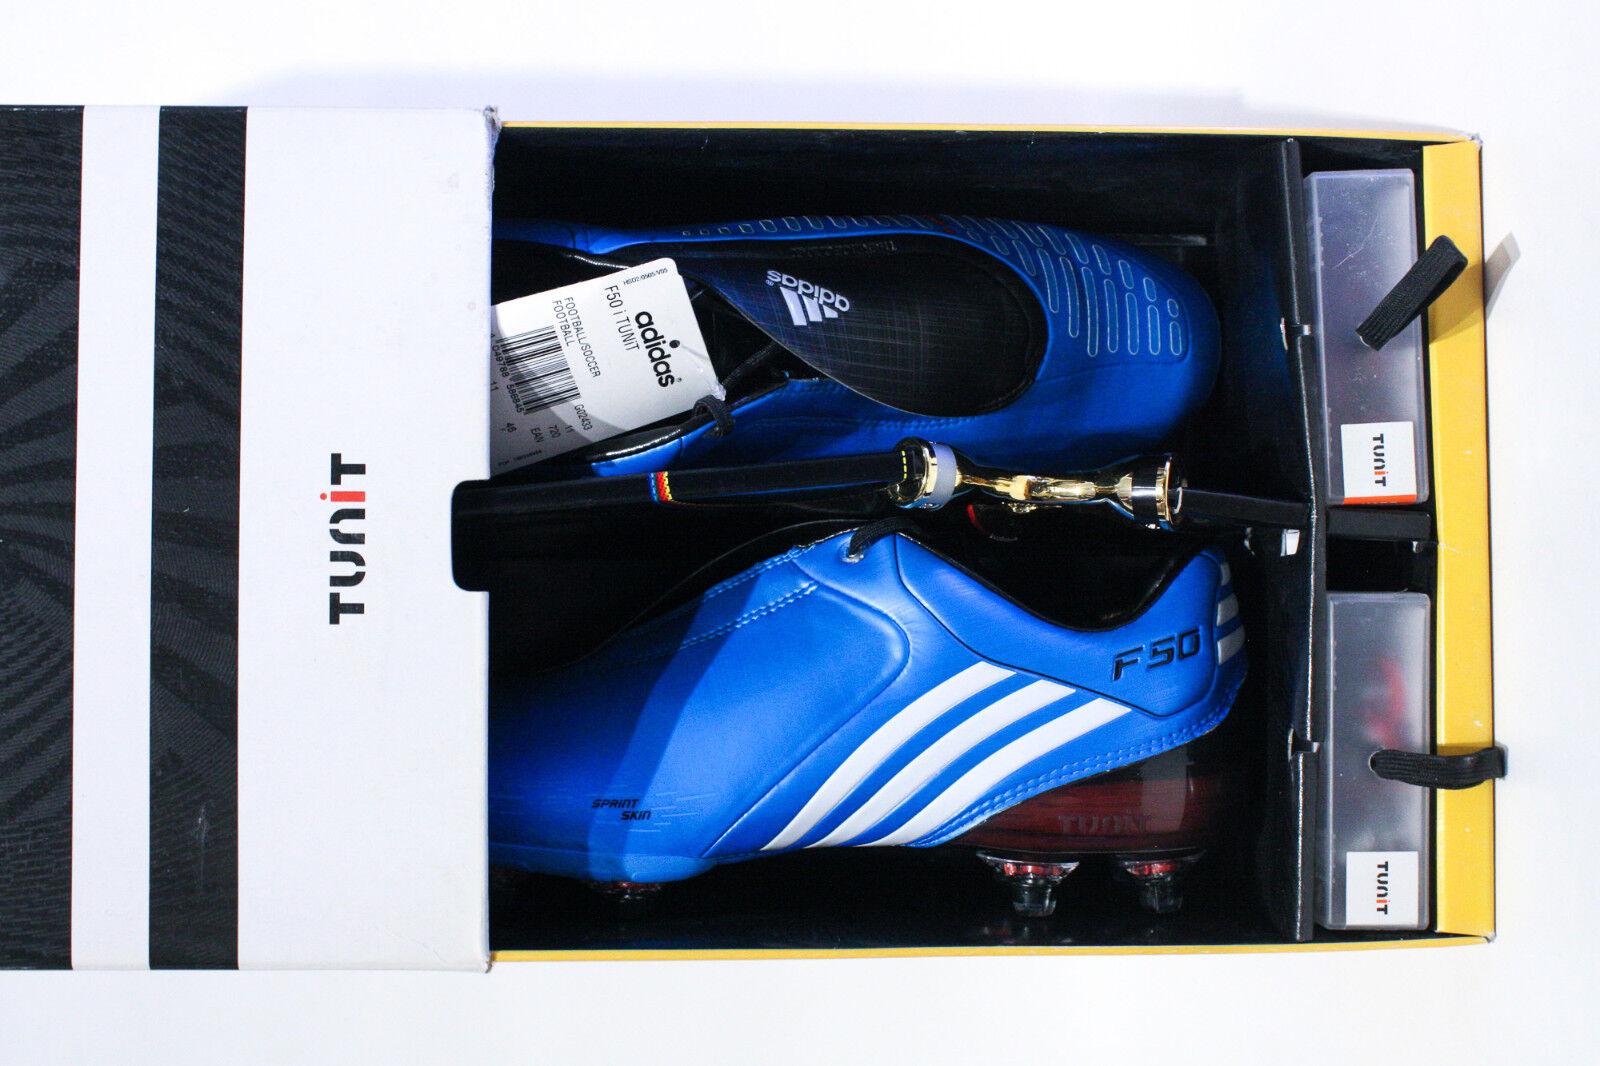 Adidas Tunit F50 i US11.5 FG Messi G02433 Limited Edition adiZero Prossoator F50i